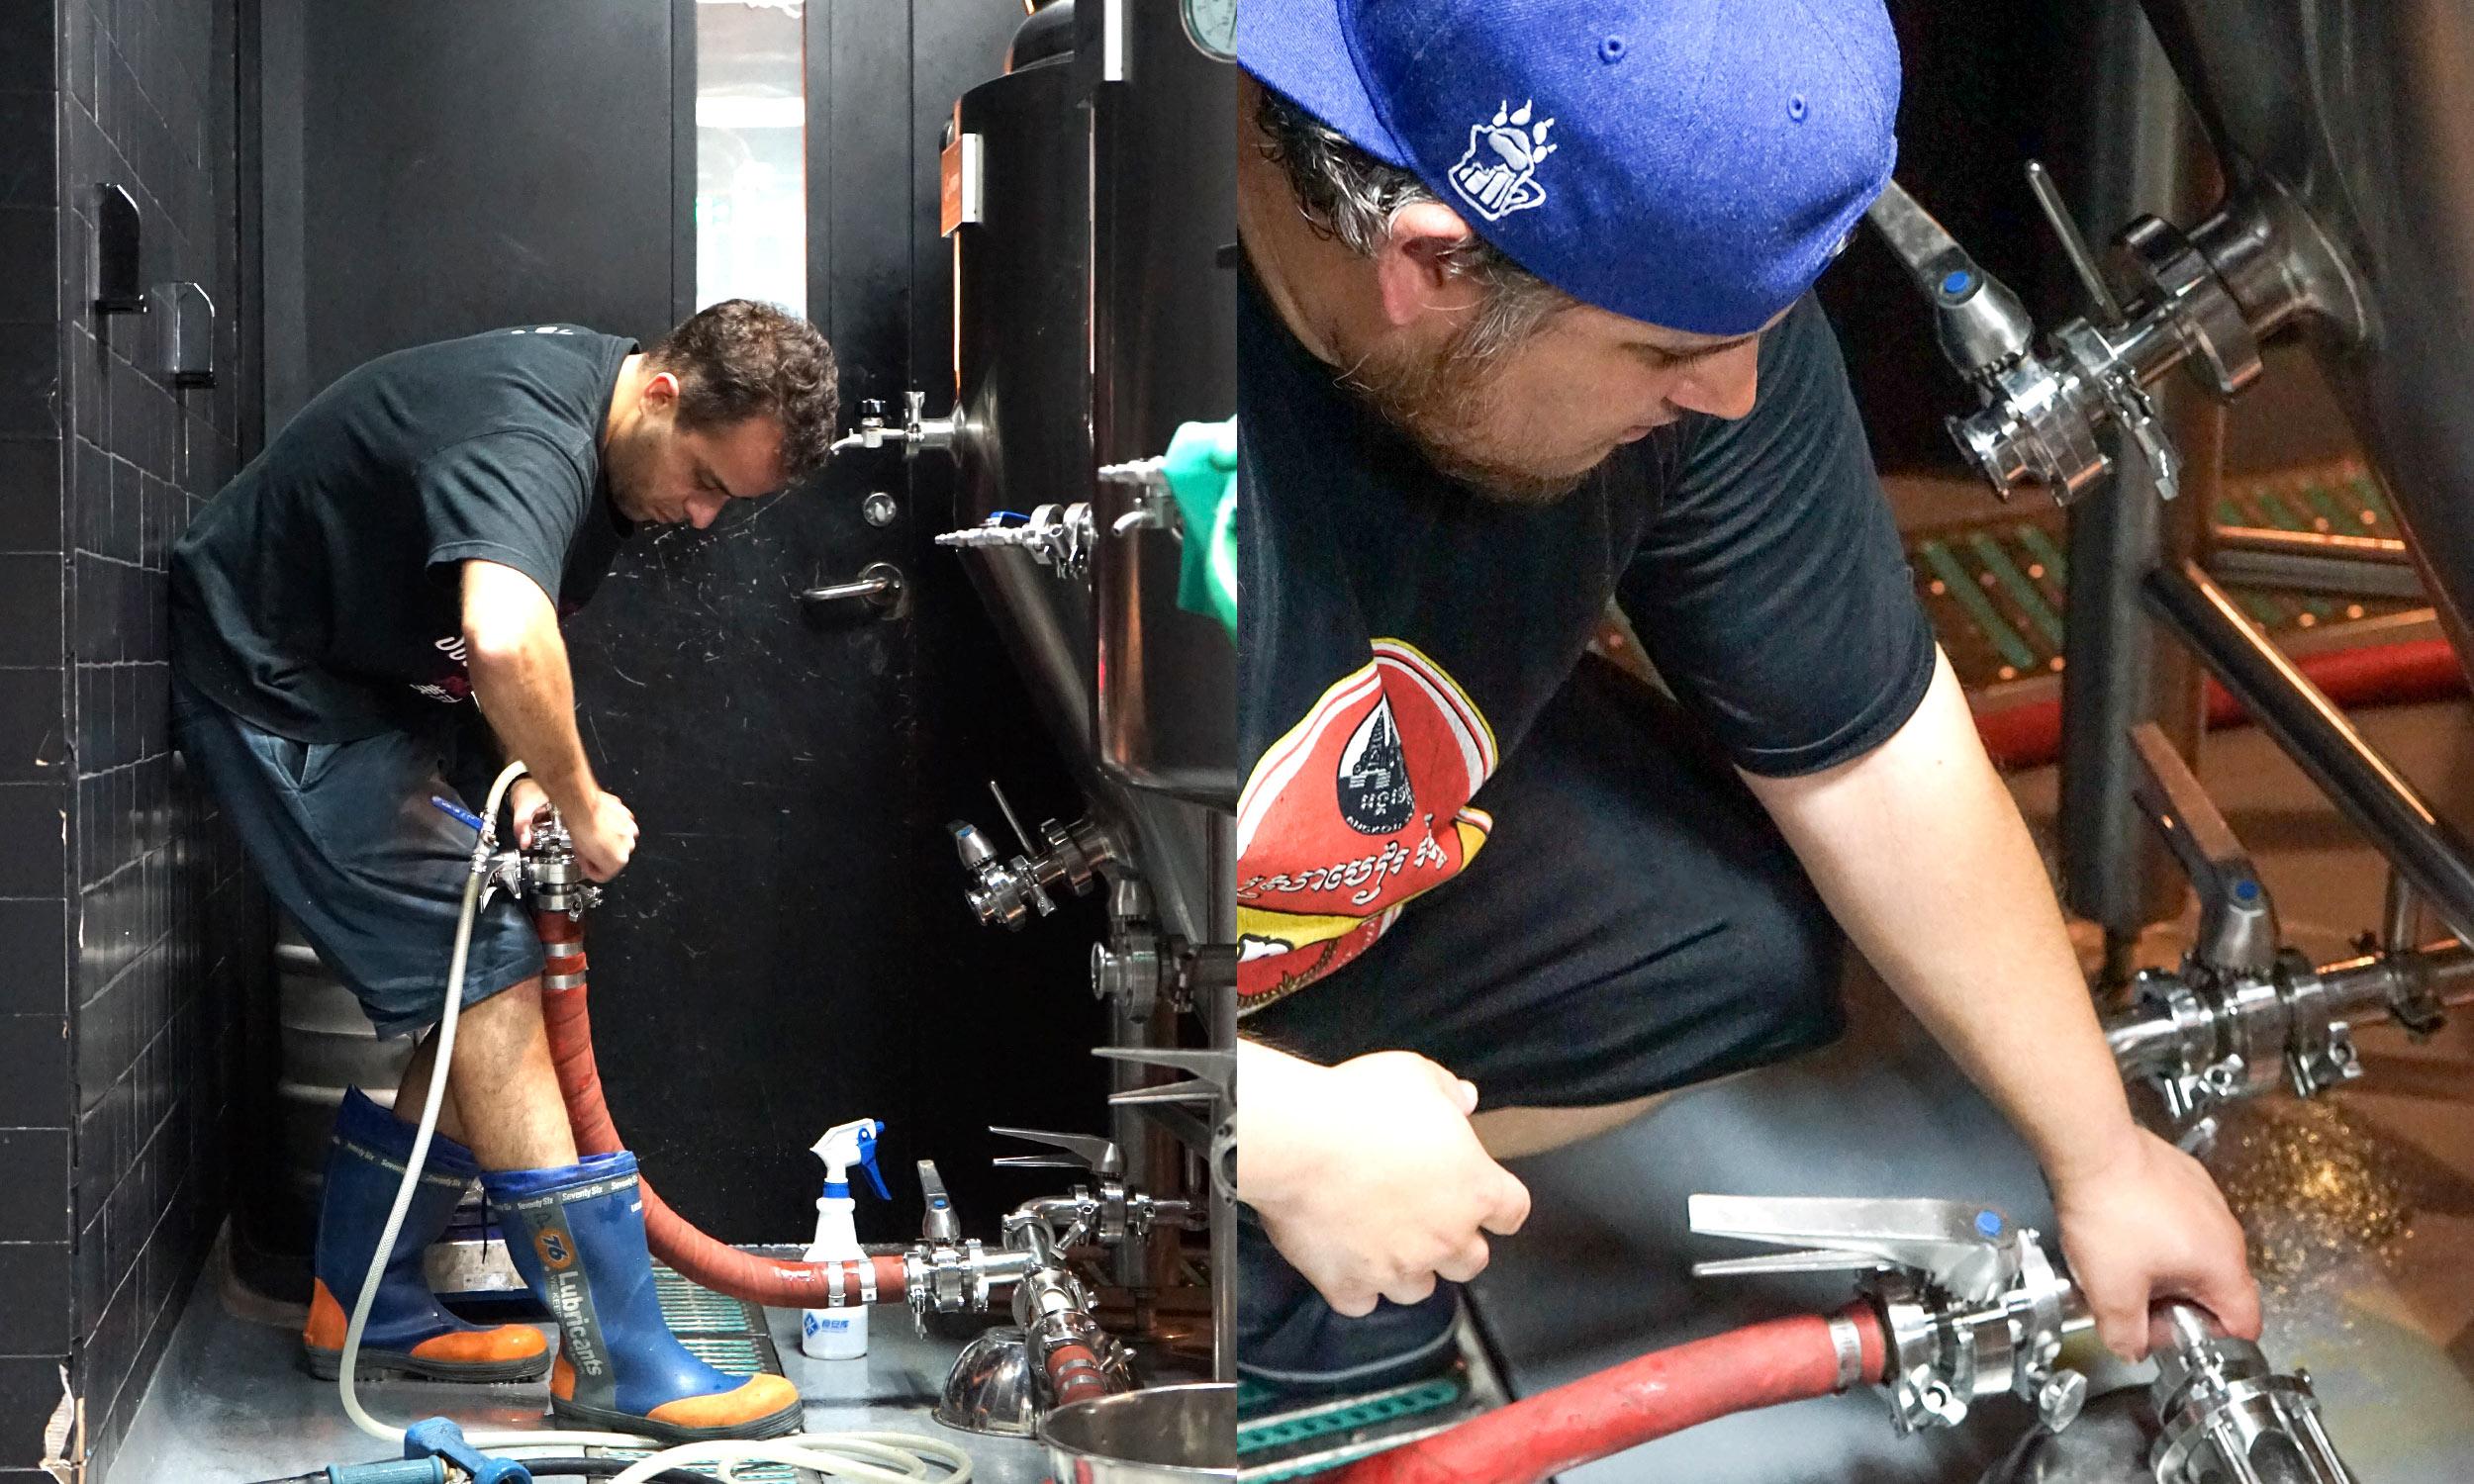 Assistant brewer, Jaoa Pedro (left) and Head Brewer, Matt Jimenez on a brew day.